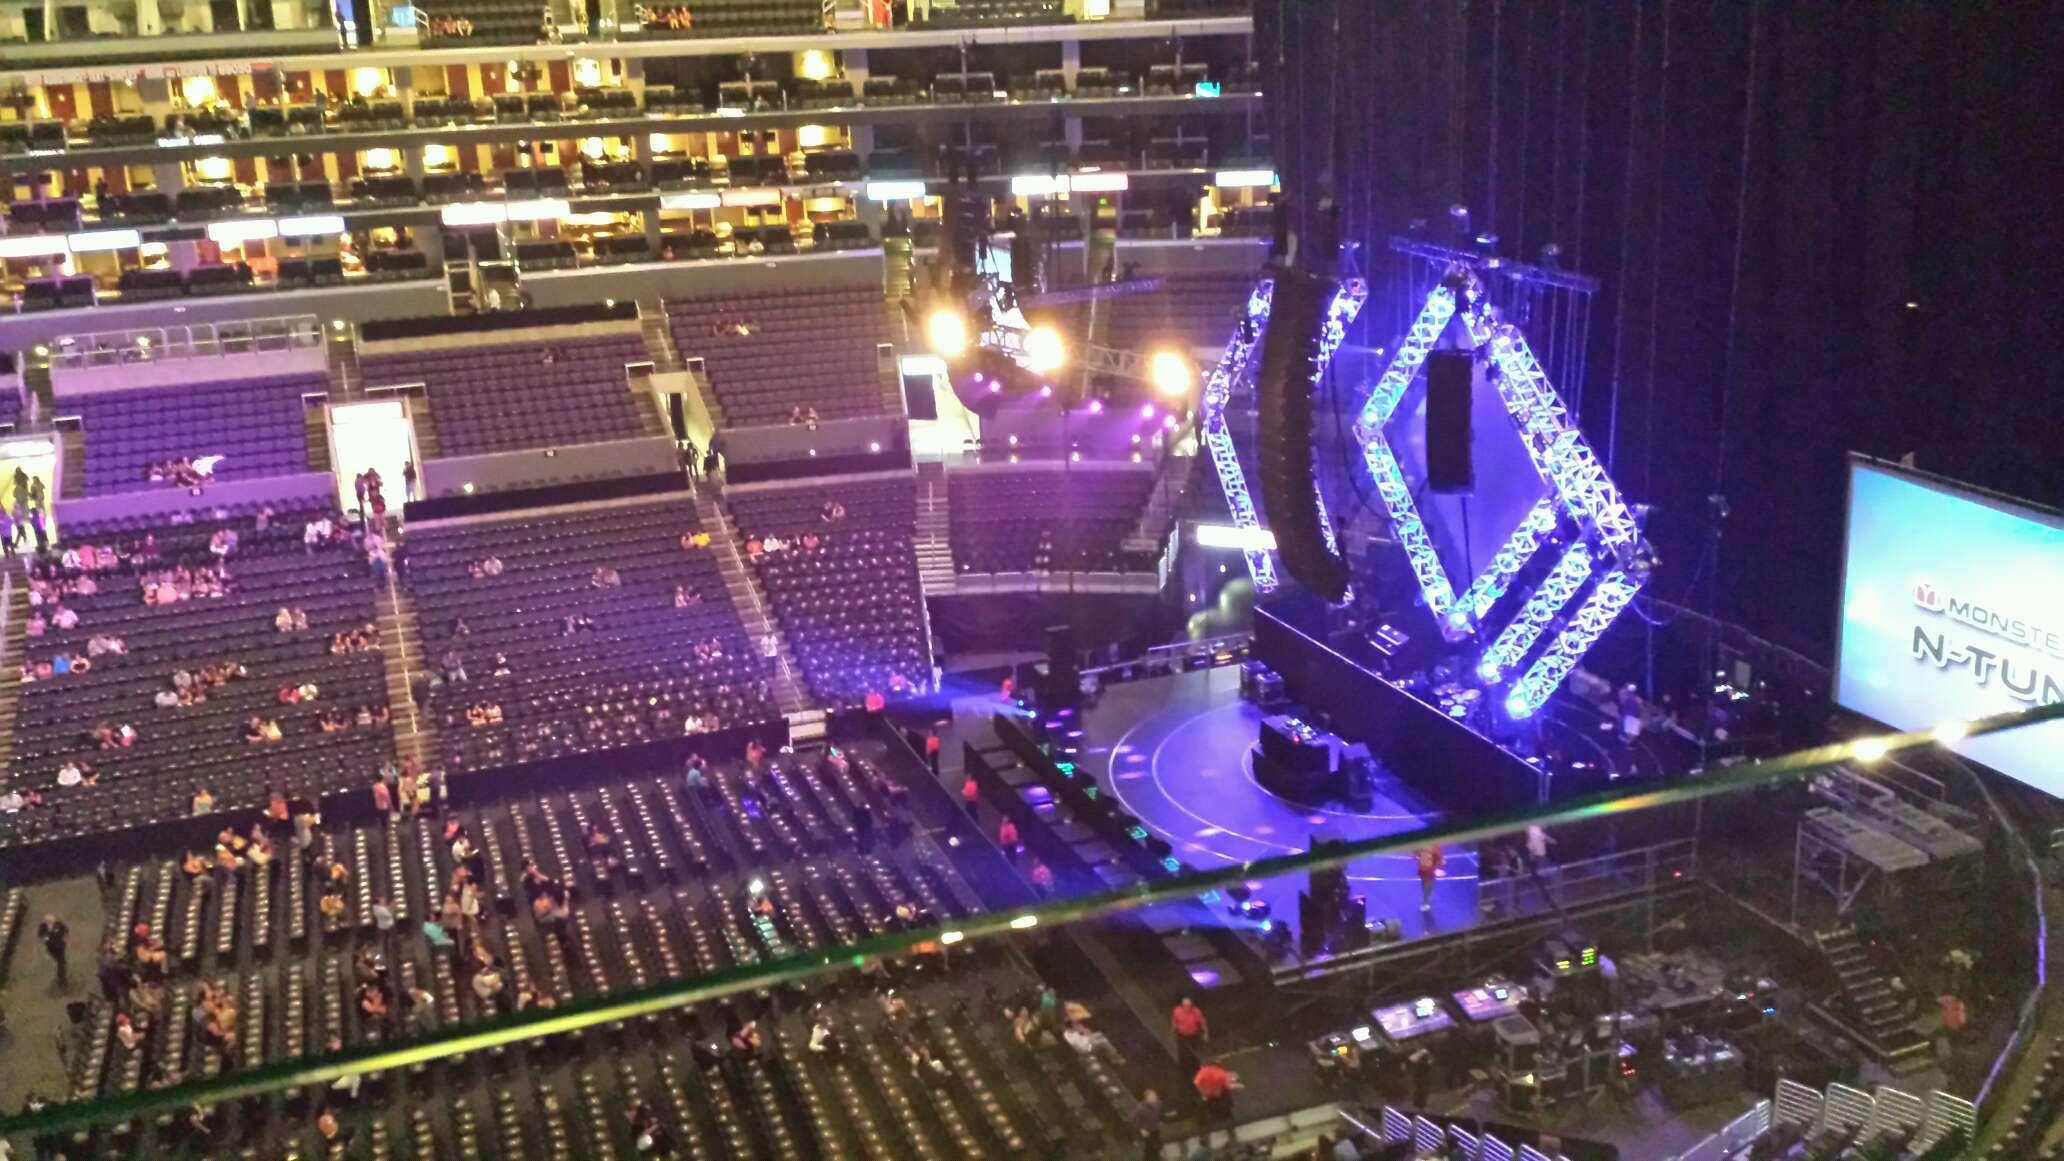 Staples Center Section 301 Row 001 Seat 1 Vs Calibash